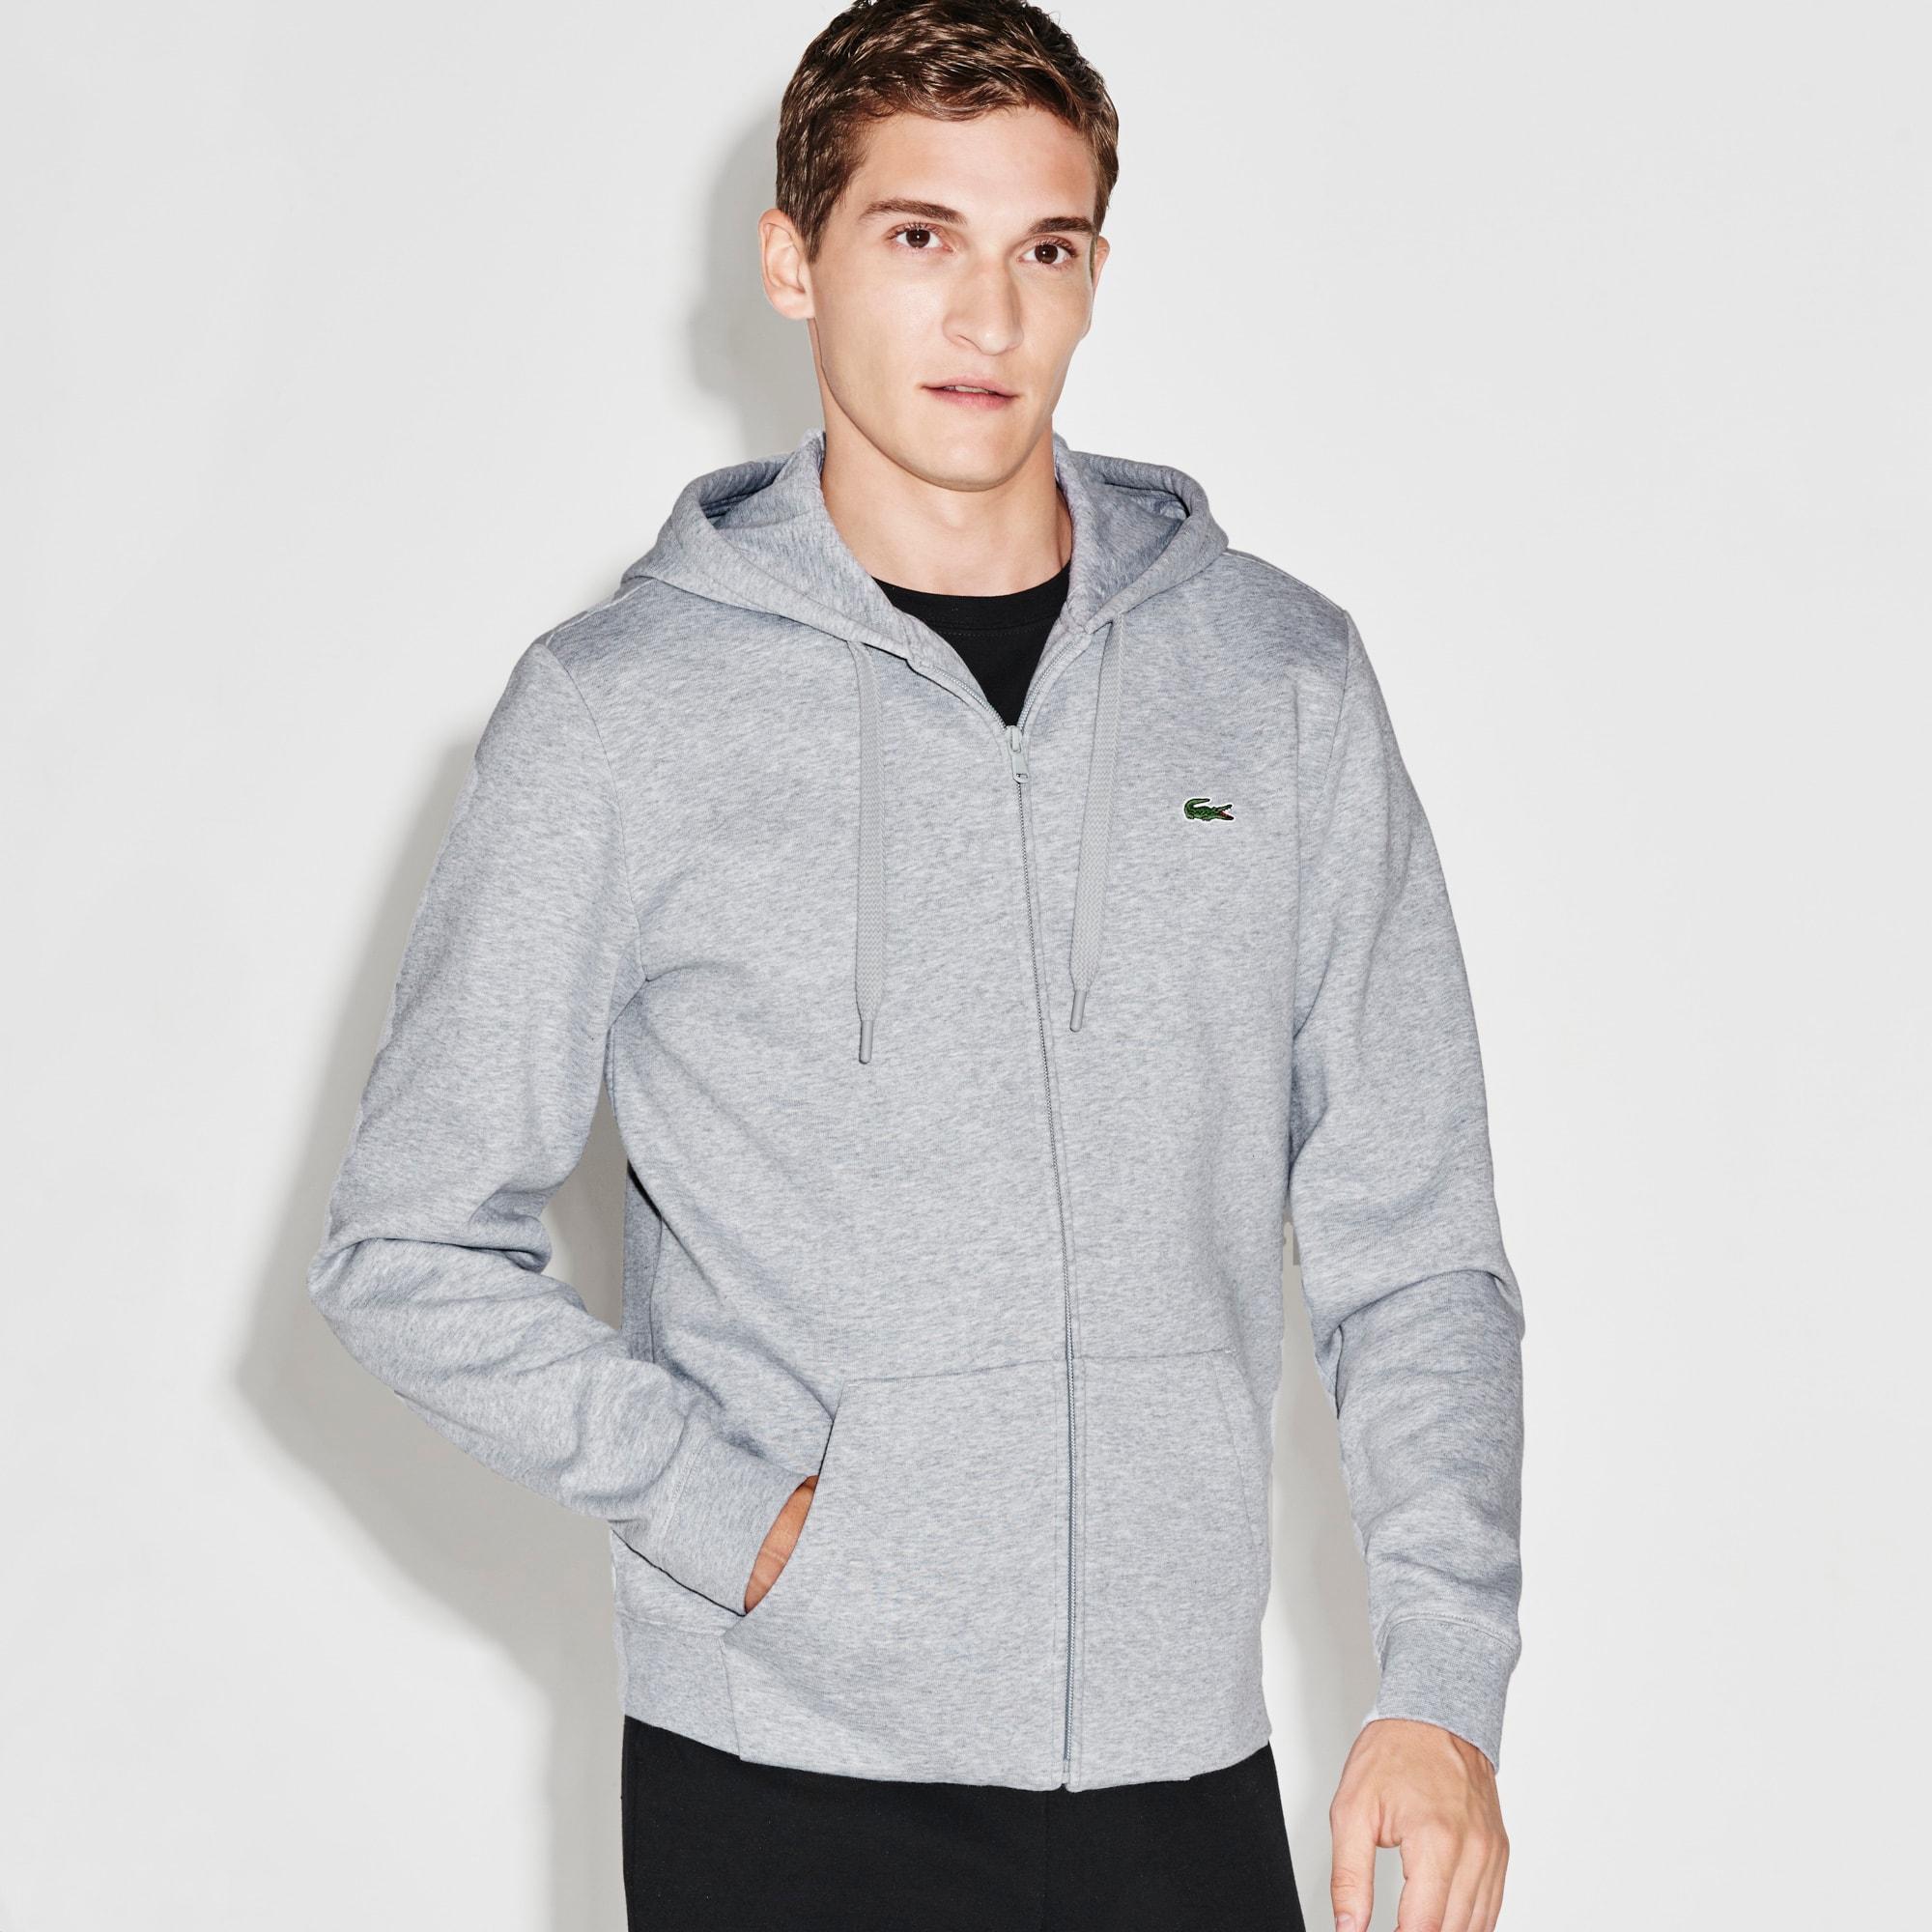 men 39 s sweatshirts hoodies lacoste. Black Bedroom Furniture Sets. Home Design Ideas